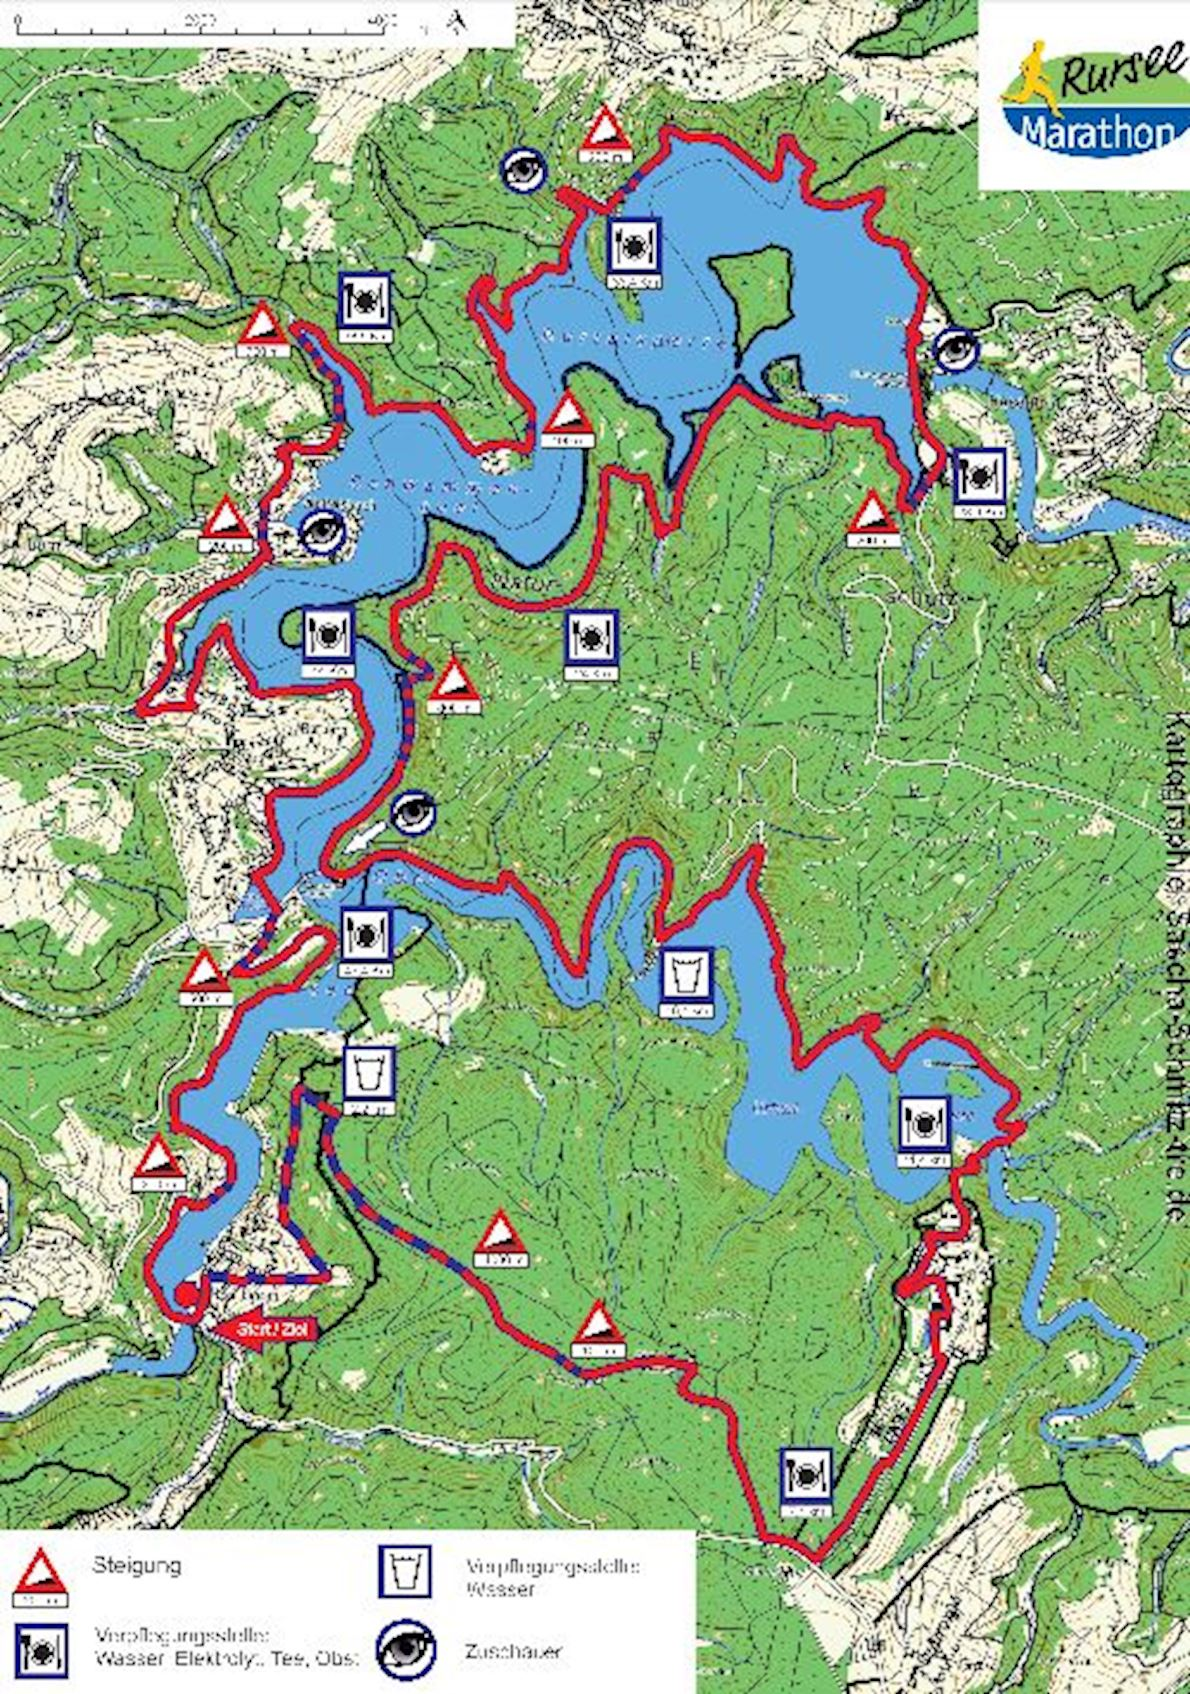 Rursee Marathon Route Map